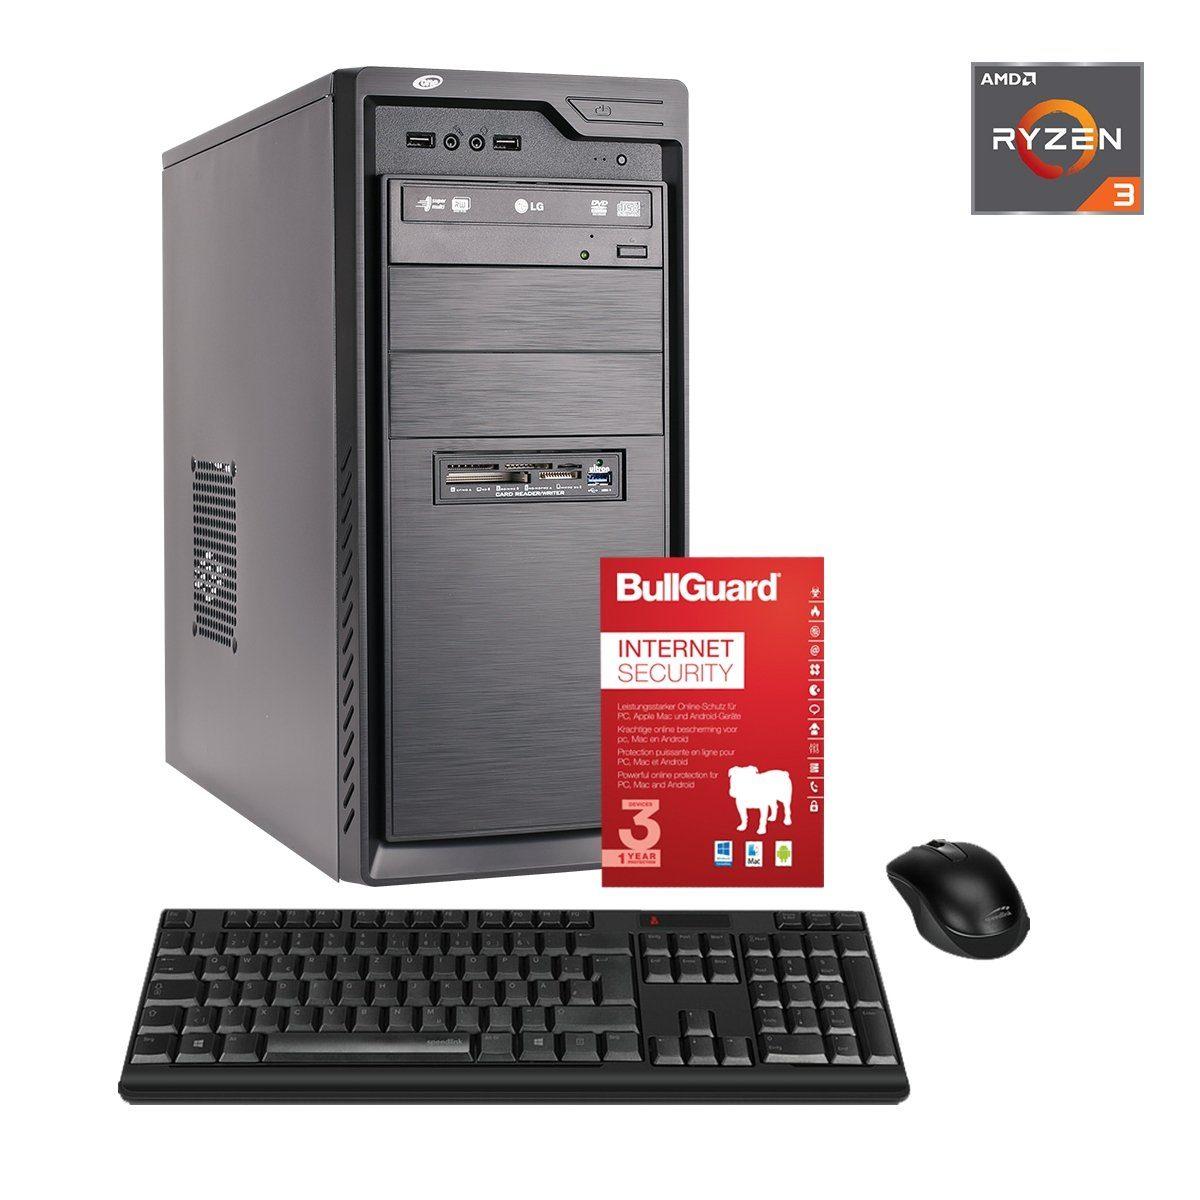 ONE PC, Ryzen 3 2200G, Radeon RX Vega 8 Graphics, 4GB DDR4 SDRAM »Office PC 44683«